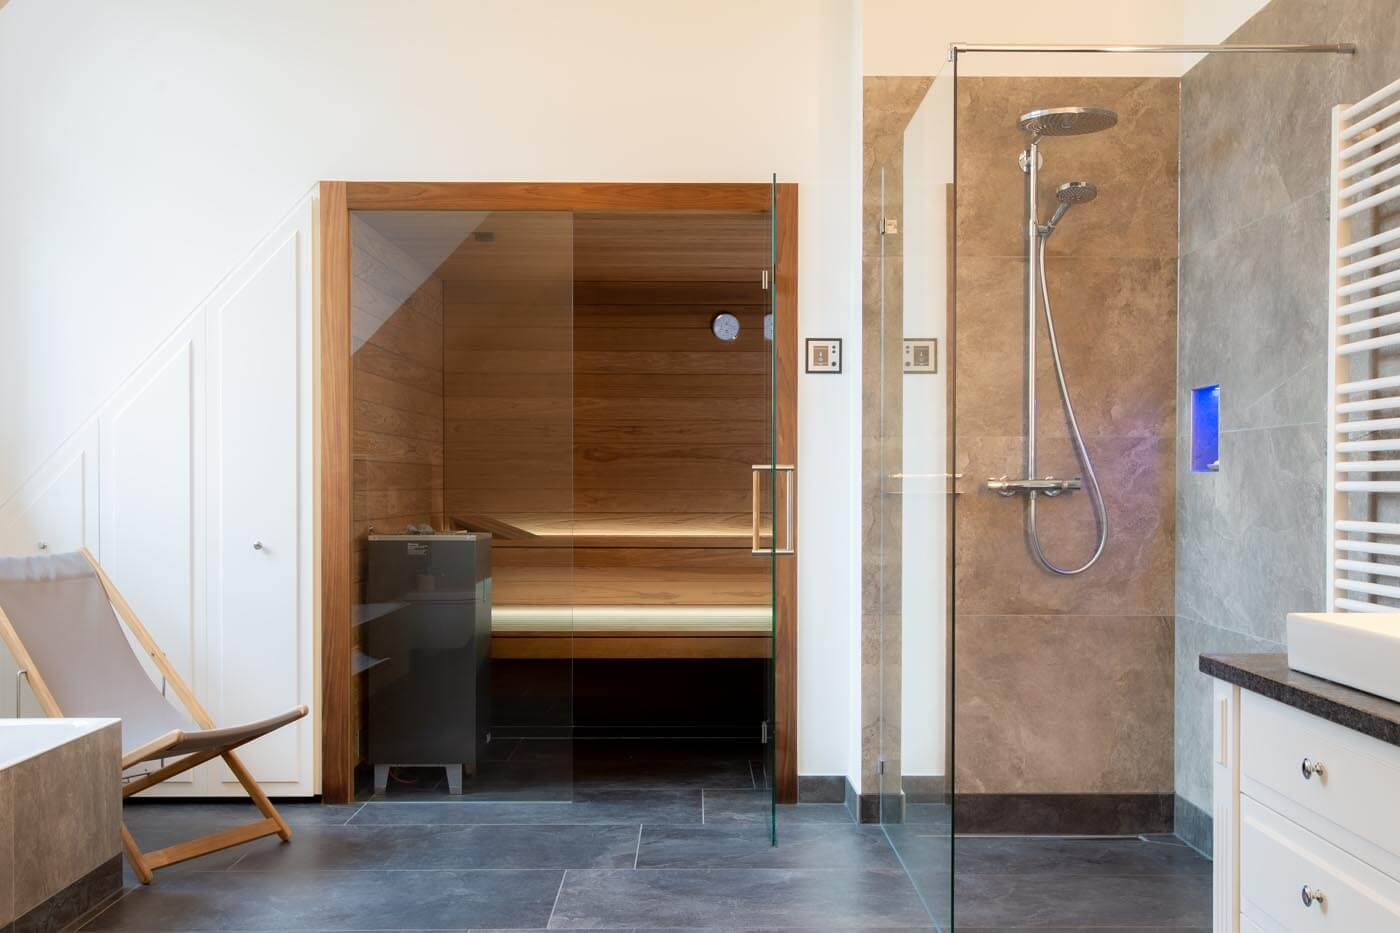 Voll integrierte Einbausauna im Bad  Maßanfertigung   corso